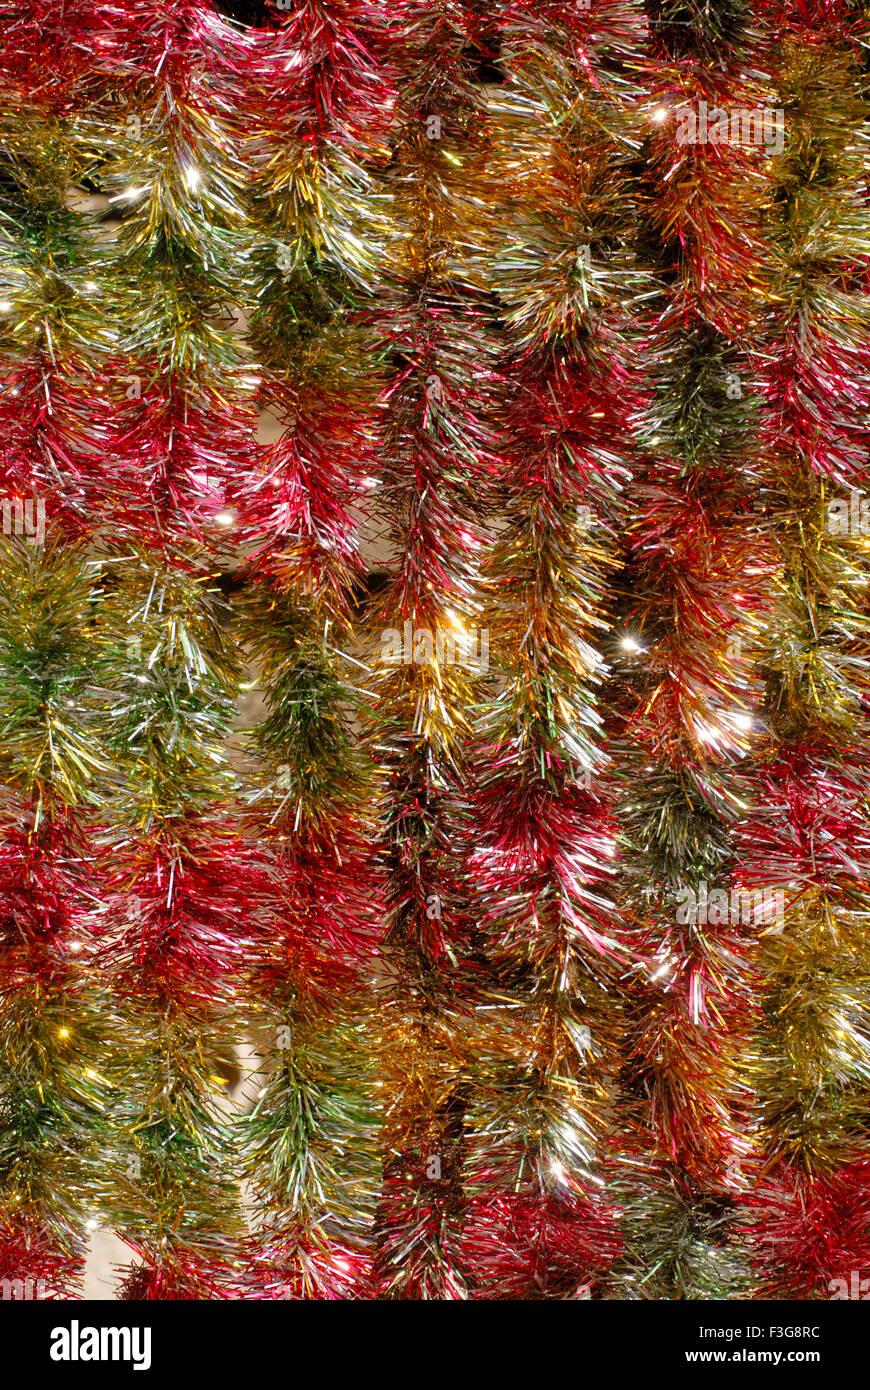 strings made colourful tinsel kept decorative material celebrating Christmas Festival kept sell shop Borivali Mumbai - Stock Image